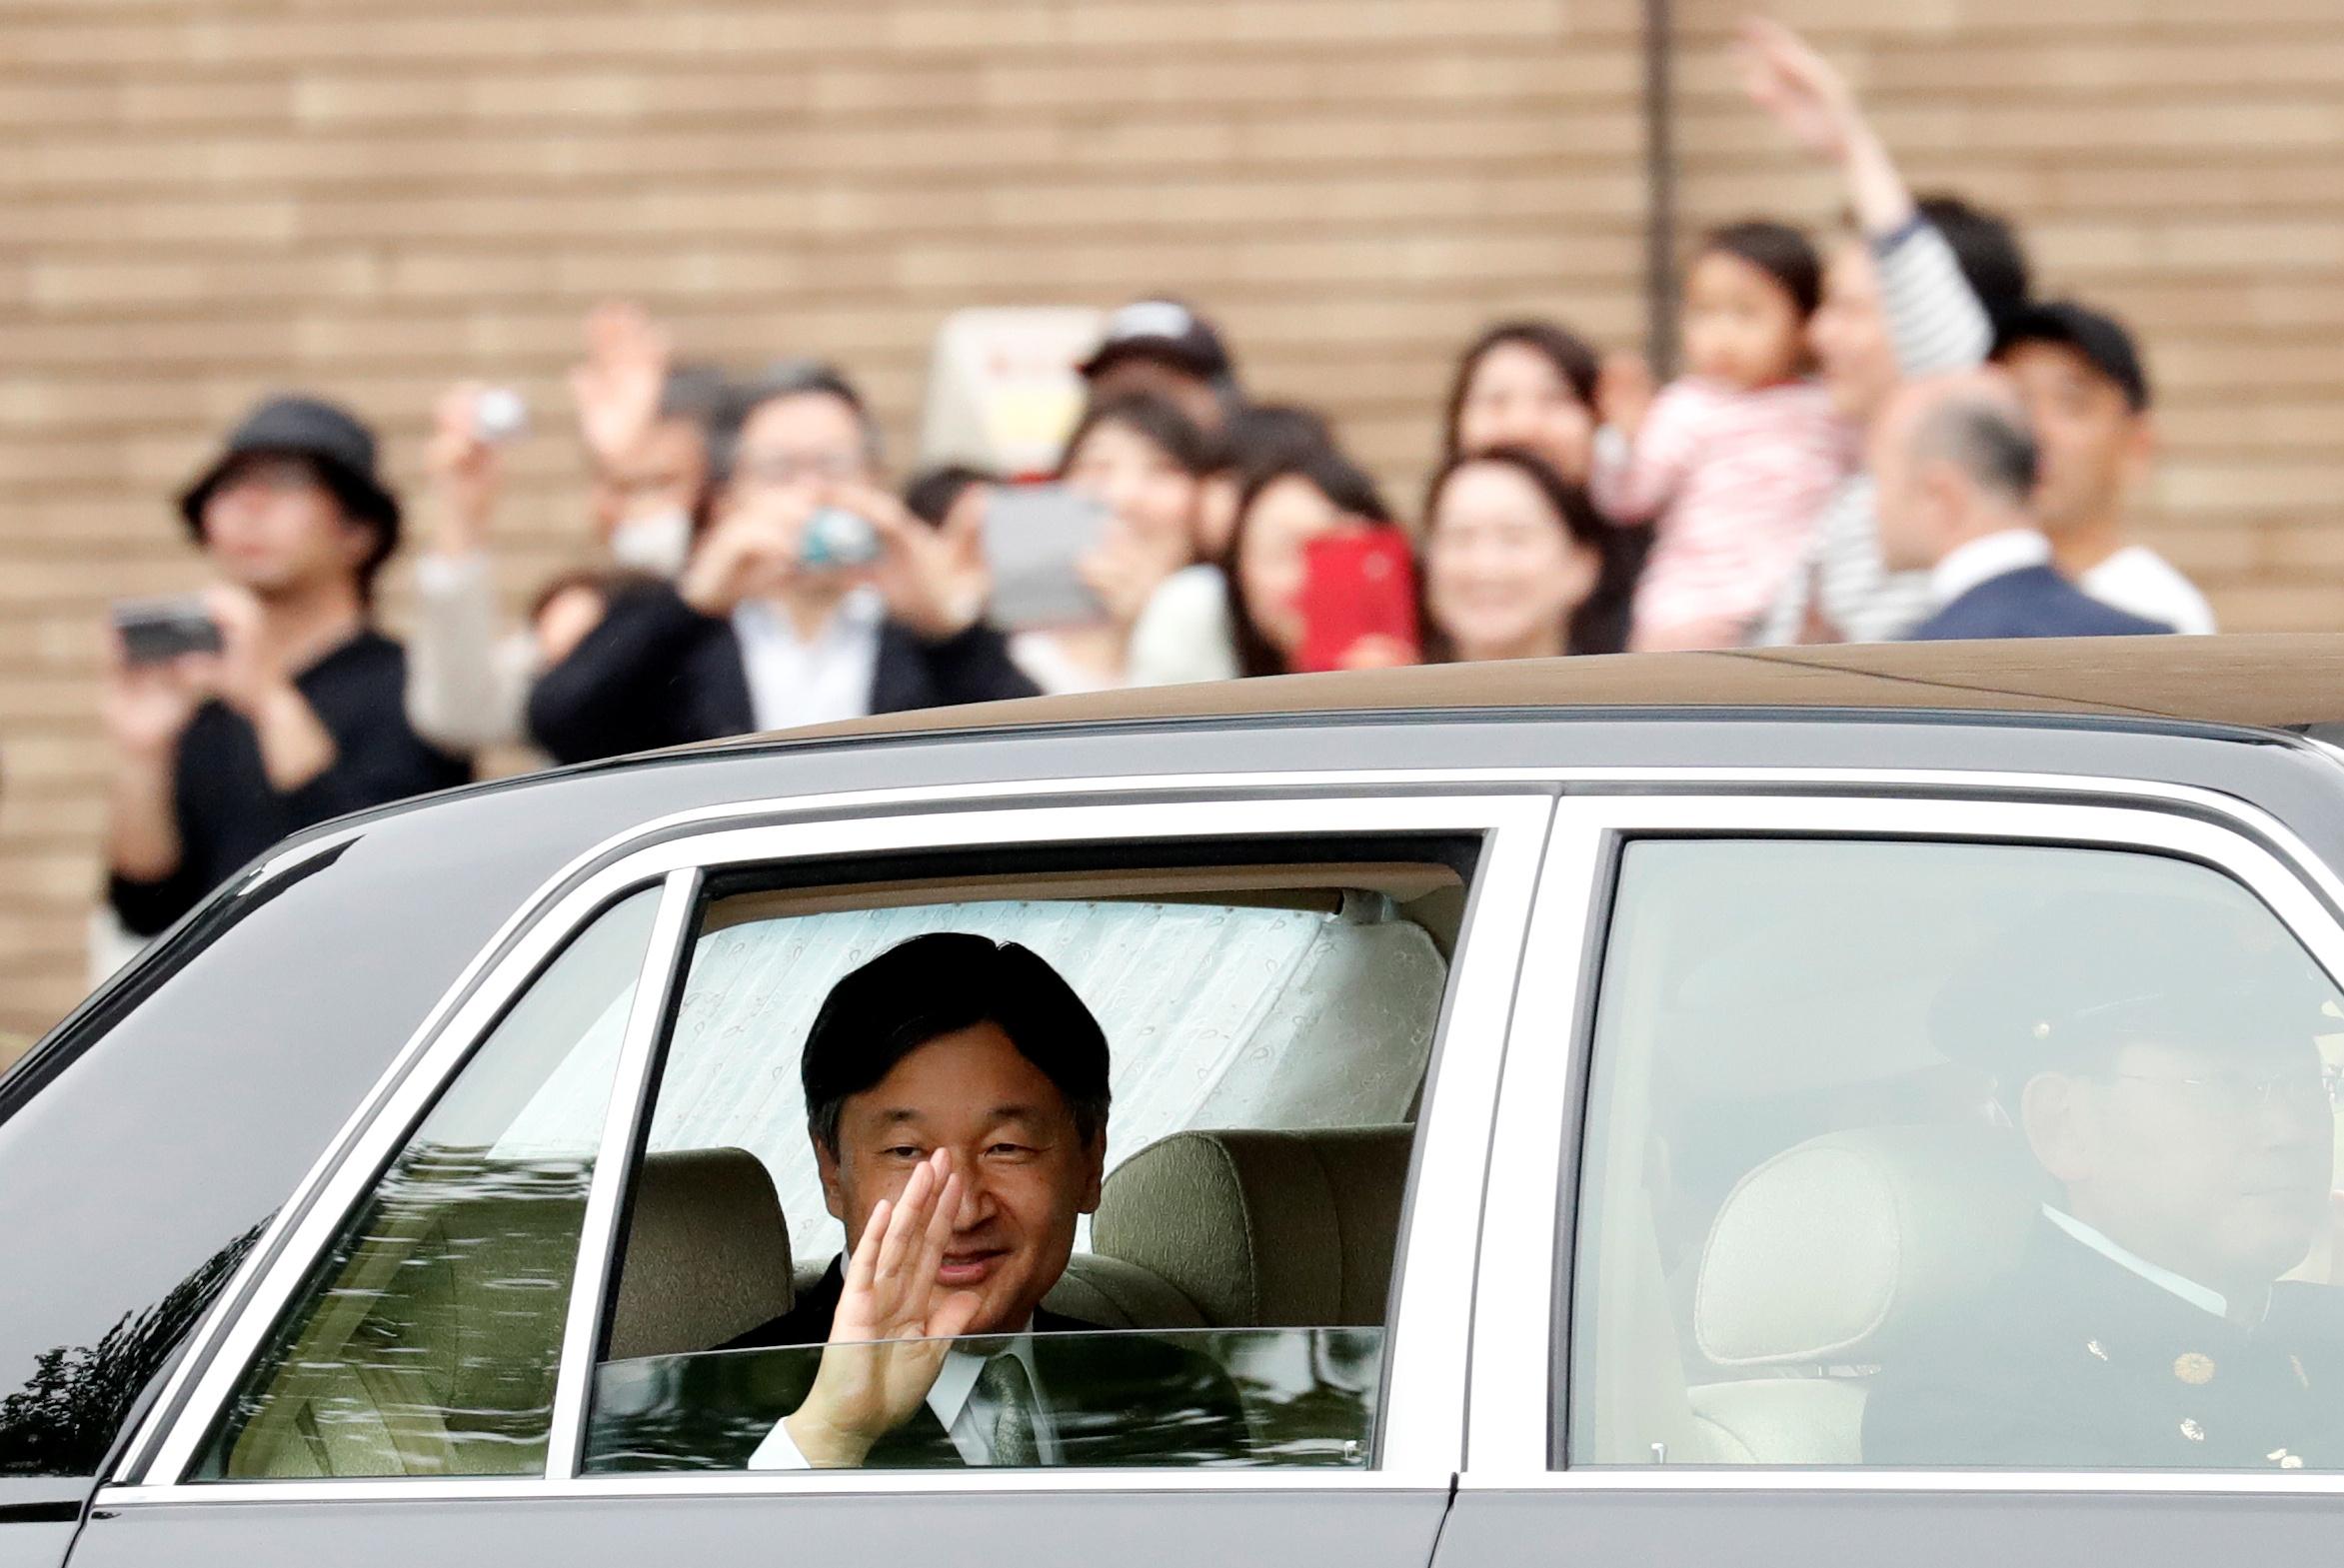 Japan's new Emperor Naruhito